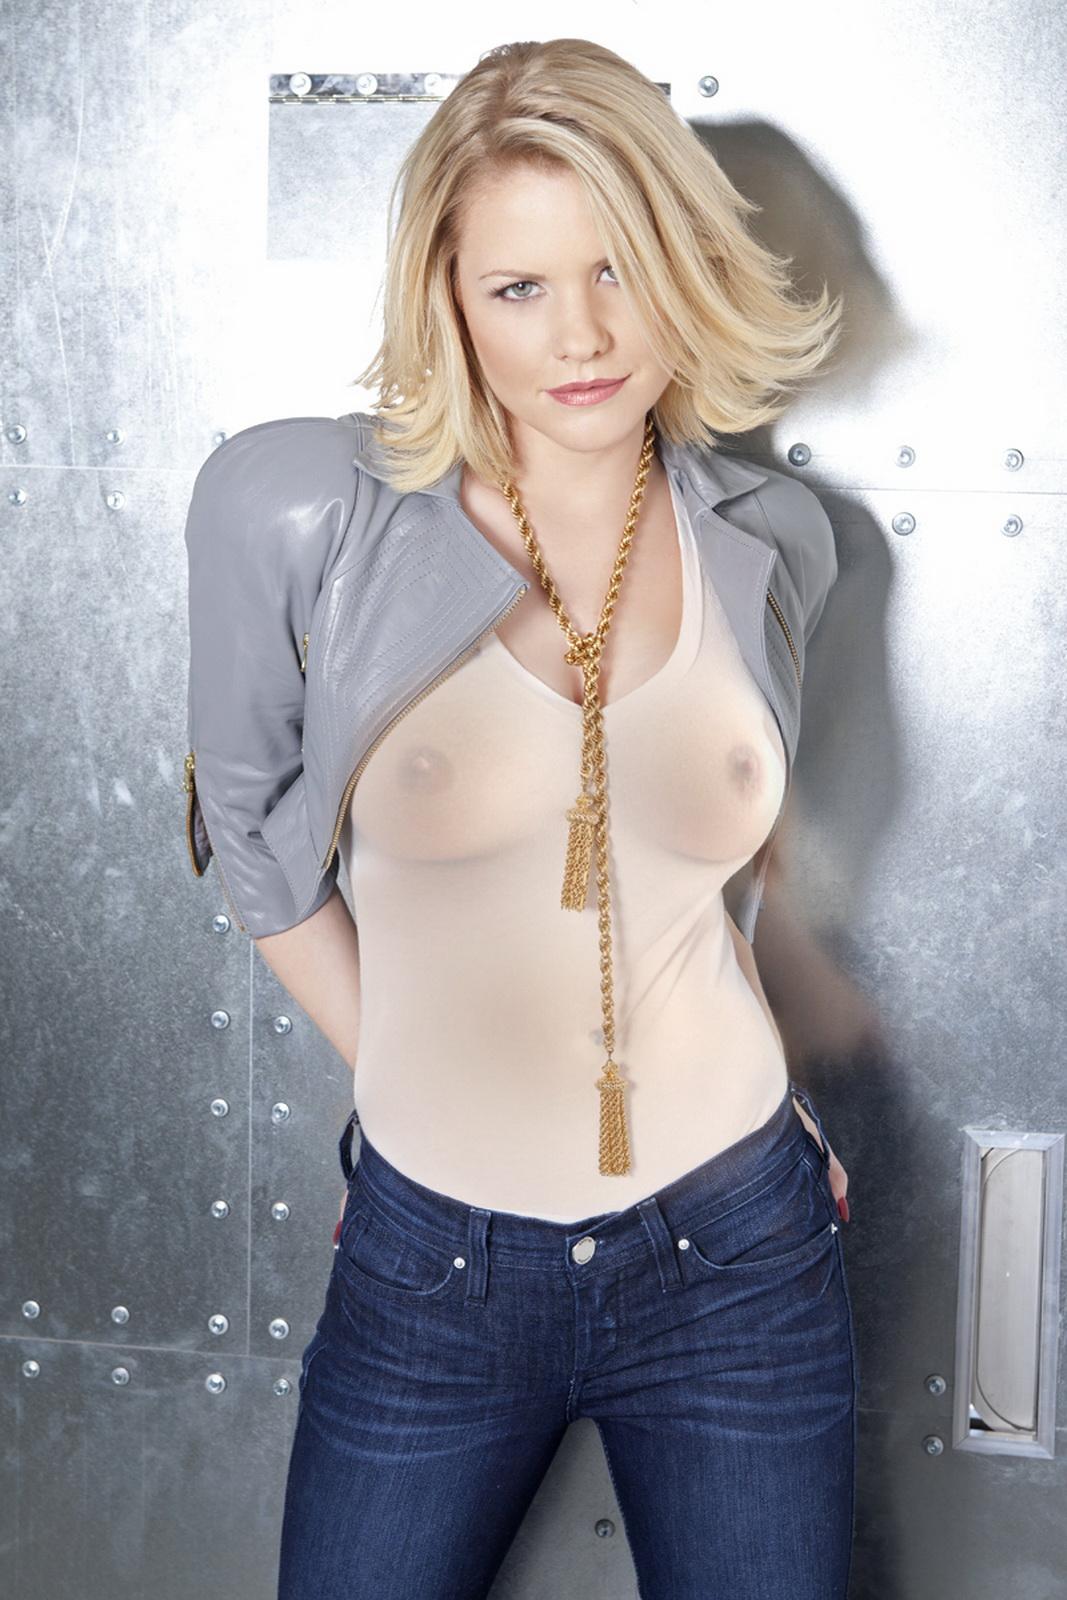 Carrie Keagan Big Tits photo 26